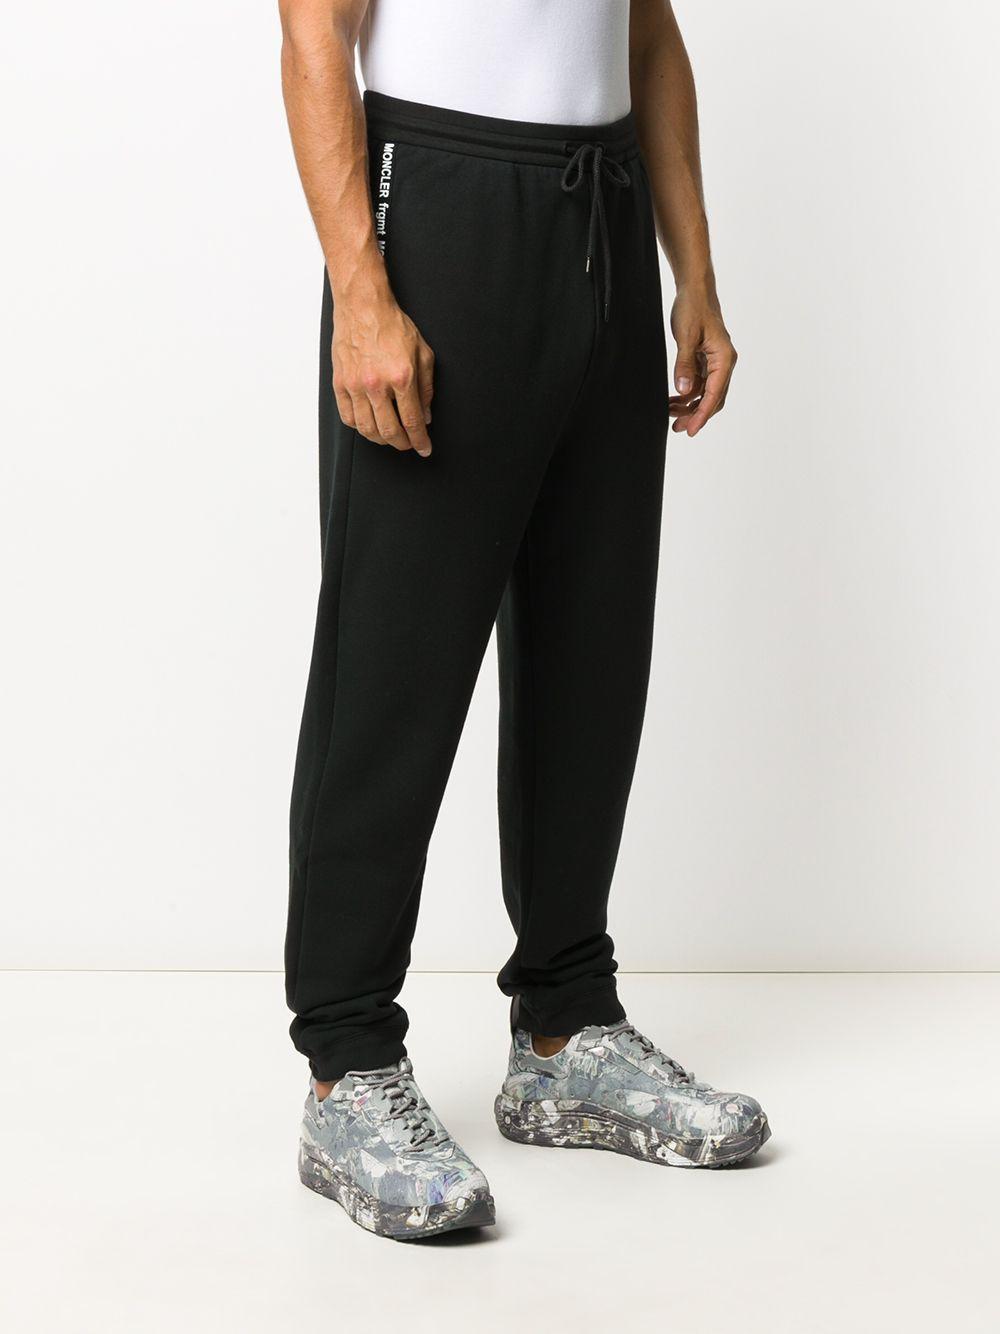 pantalone tuta in cotone nero con loghi laterali bianchi Moncler Genius x Fragment Design MONCLER GENIUS | Pantaloni | 8H701-00-809F4999